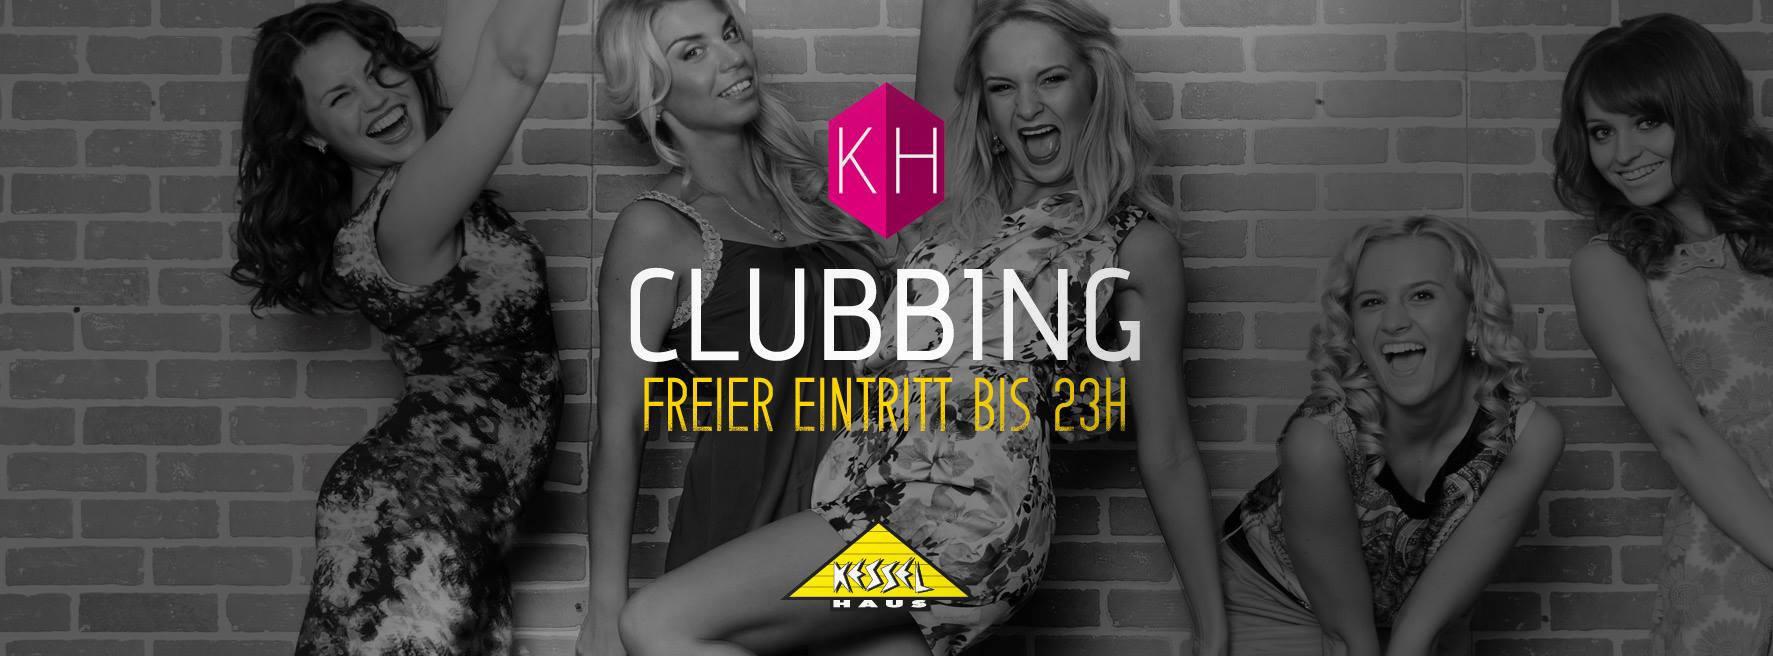 kh_clubbing_Jan19_fb